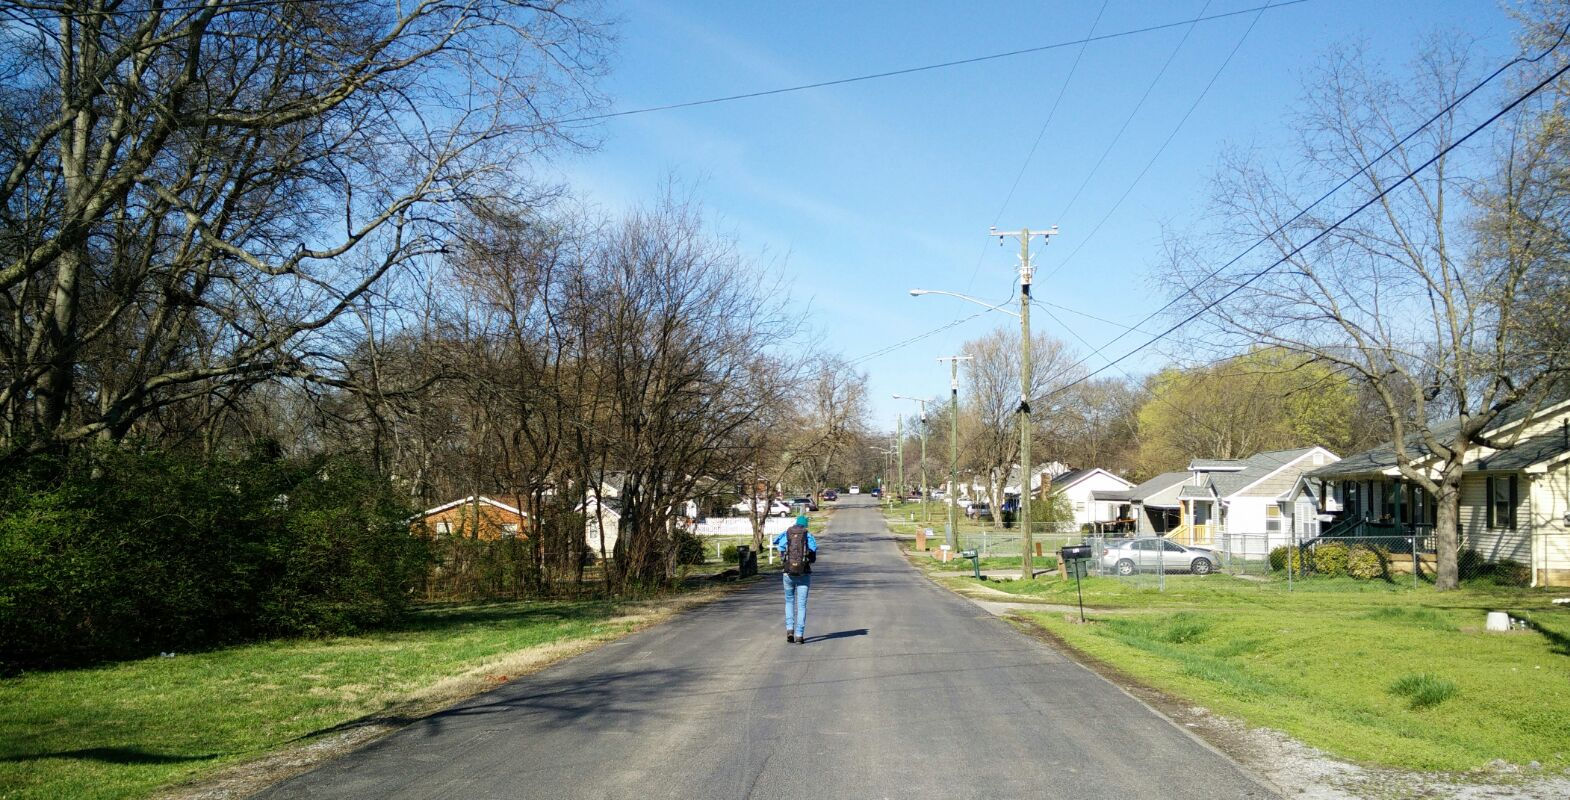 Allans Straße in Nashville